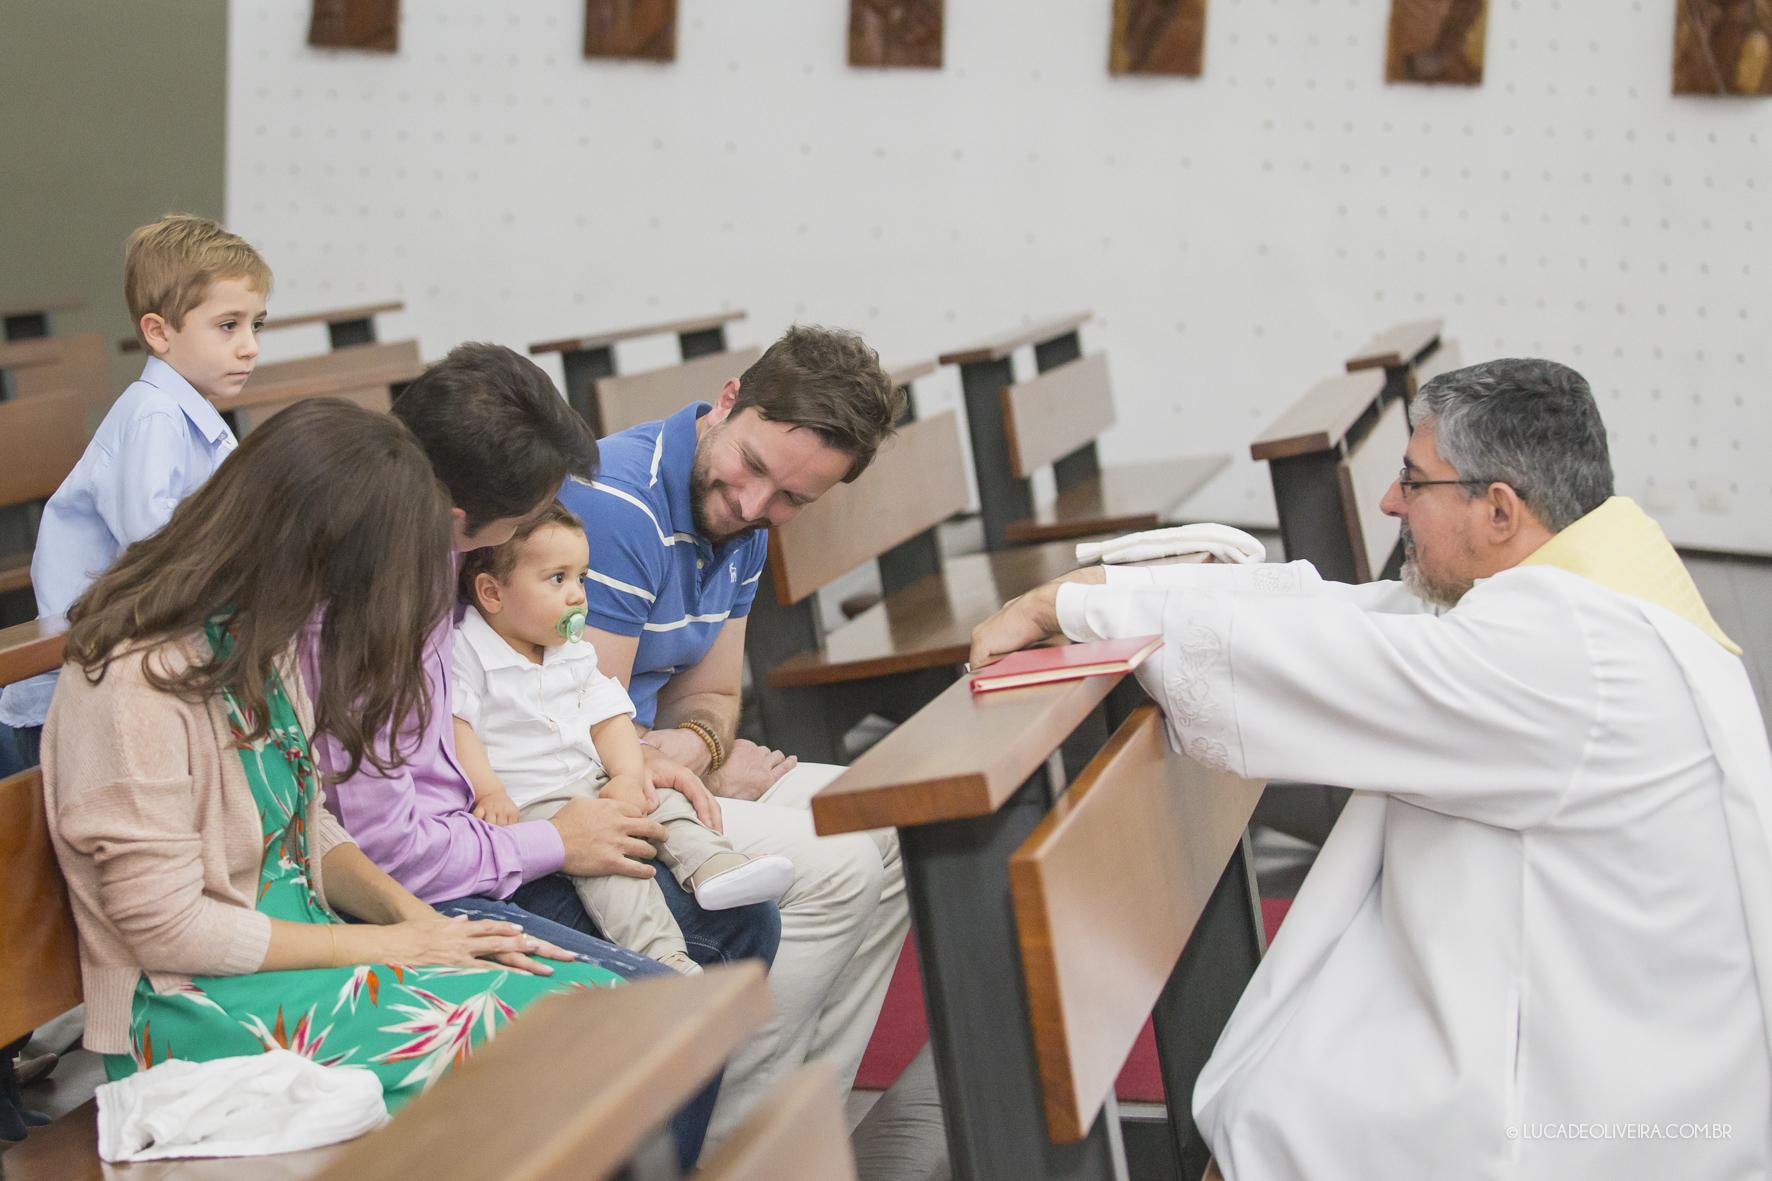 batizadosaopedorsaopaulo_lucadeoliveira_032